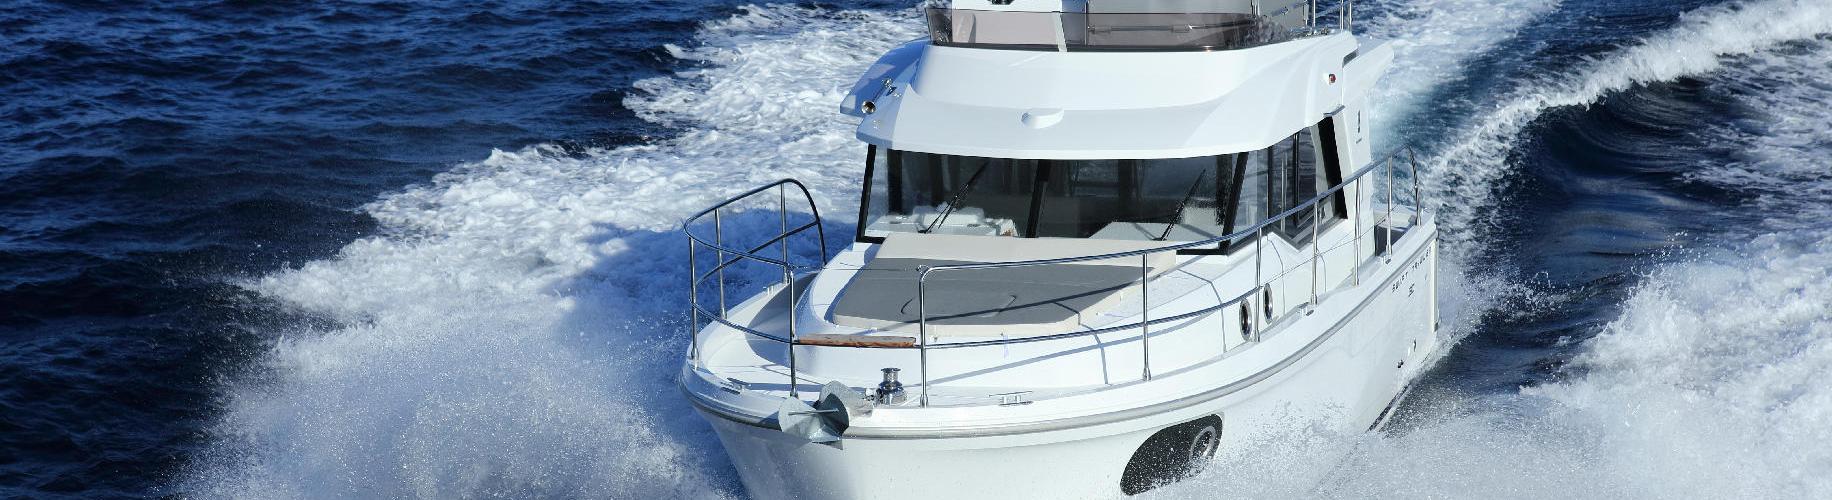 moteur bateau Swift Trawler 30